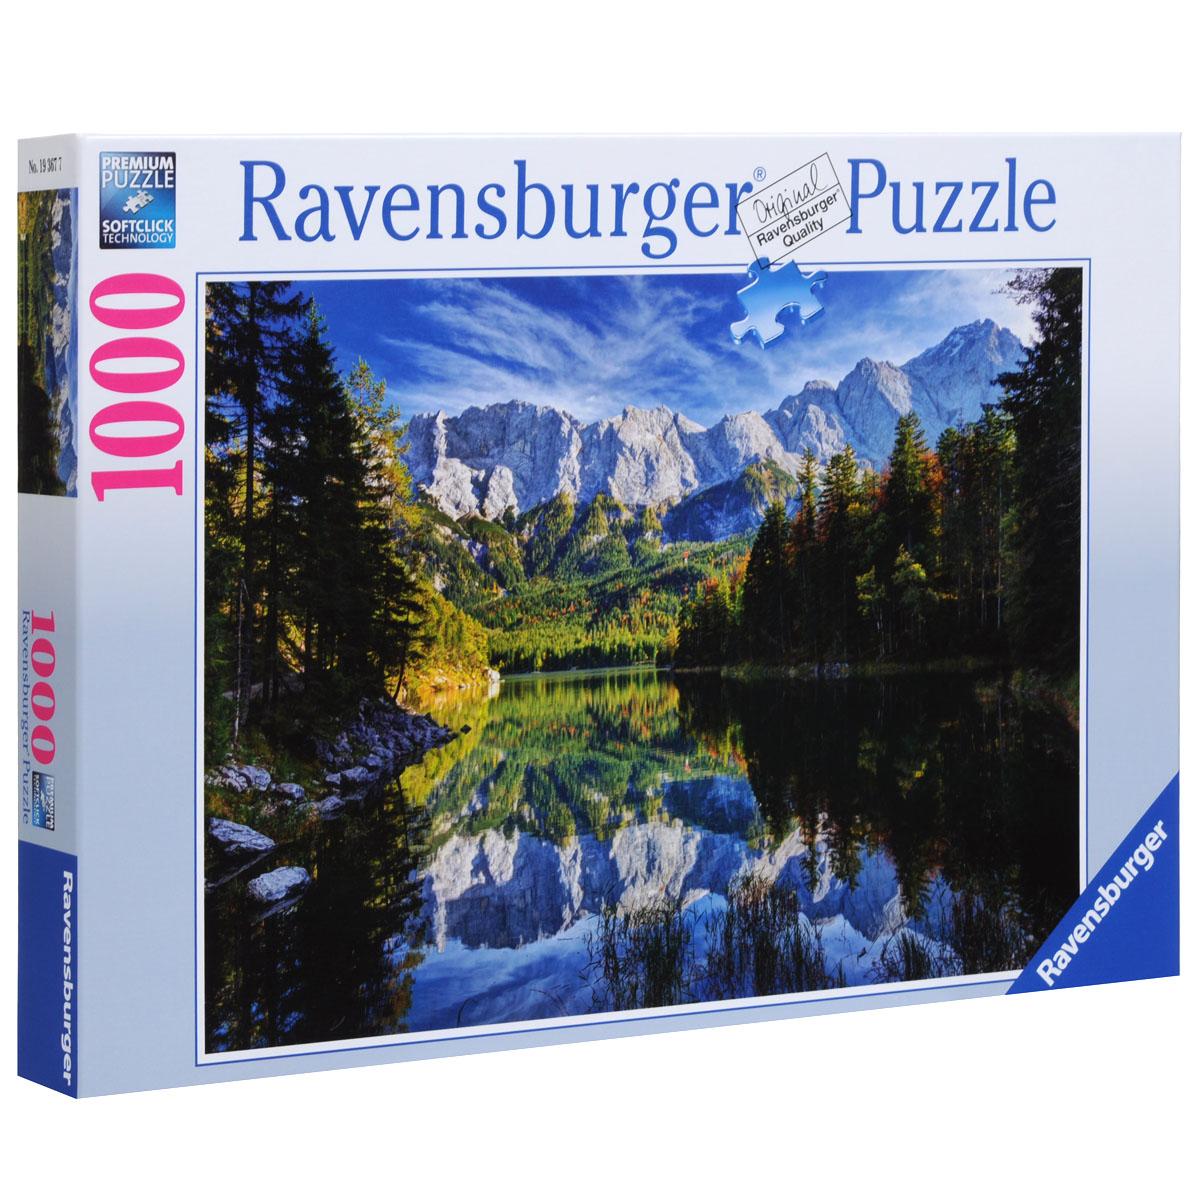 Ravensburger Озеро Эйб. Пазл, 1000 элементов